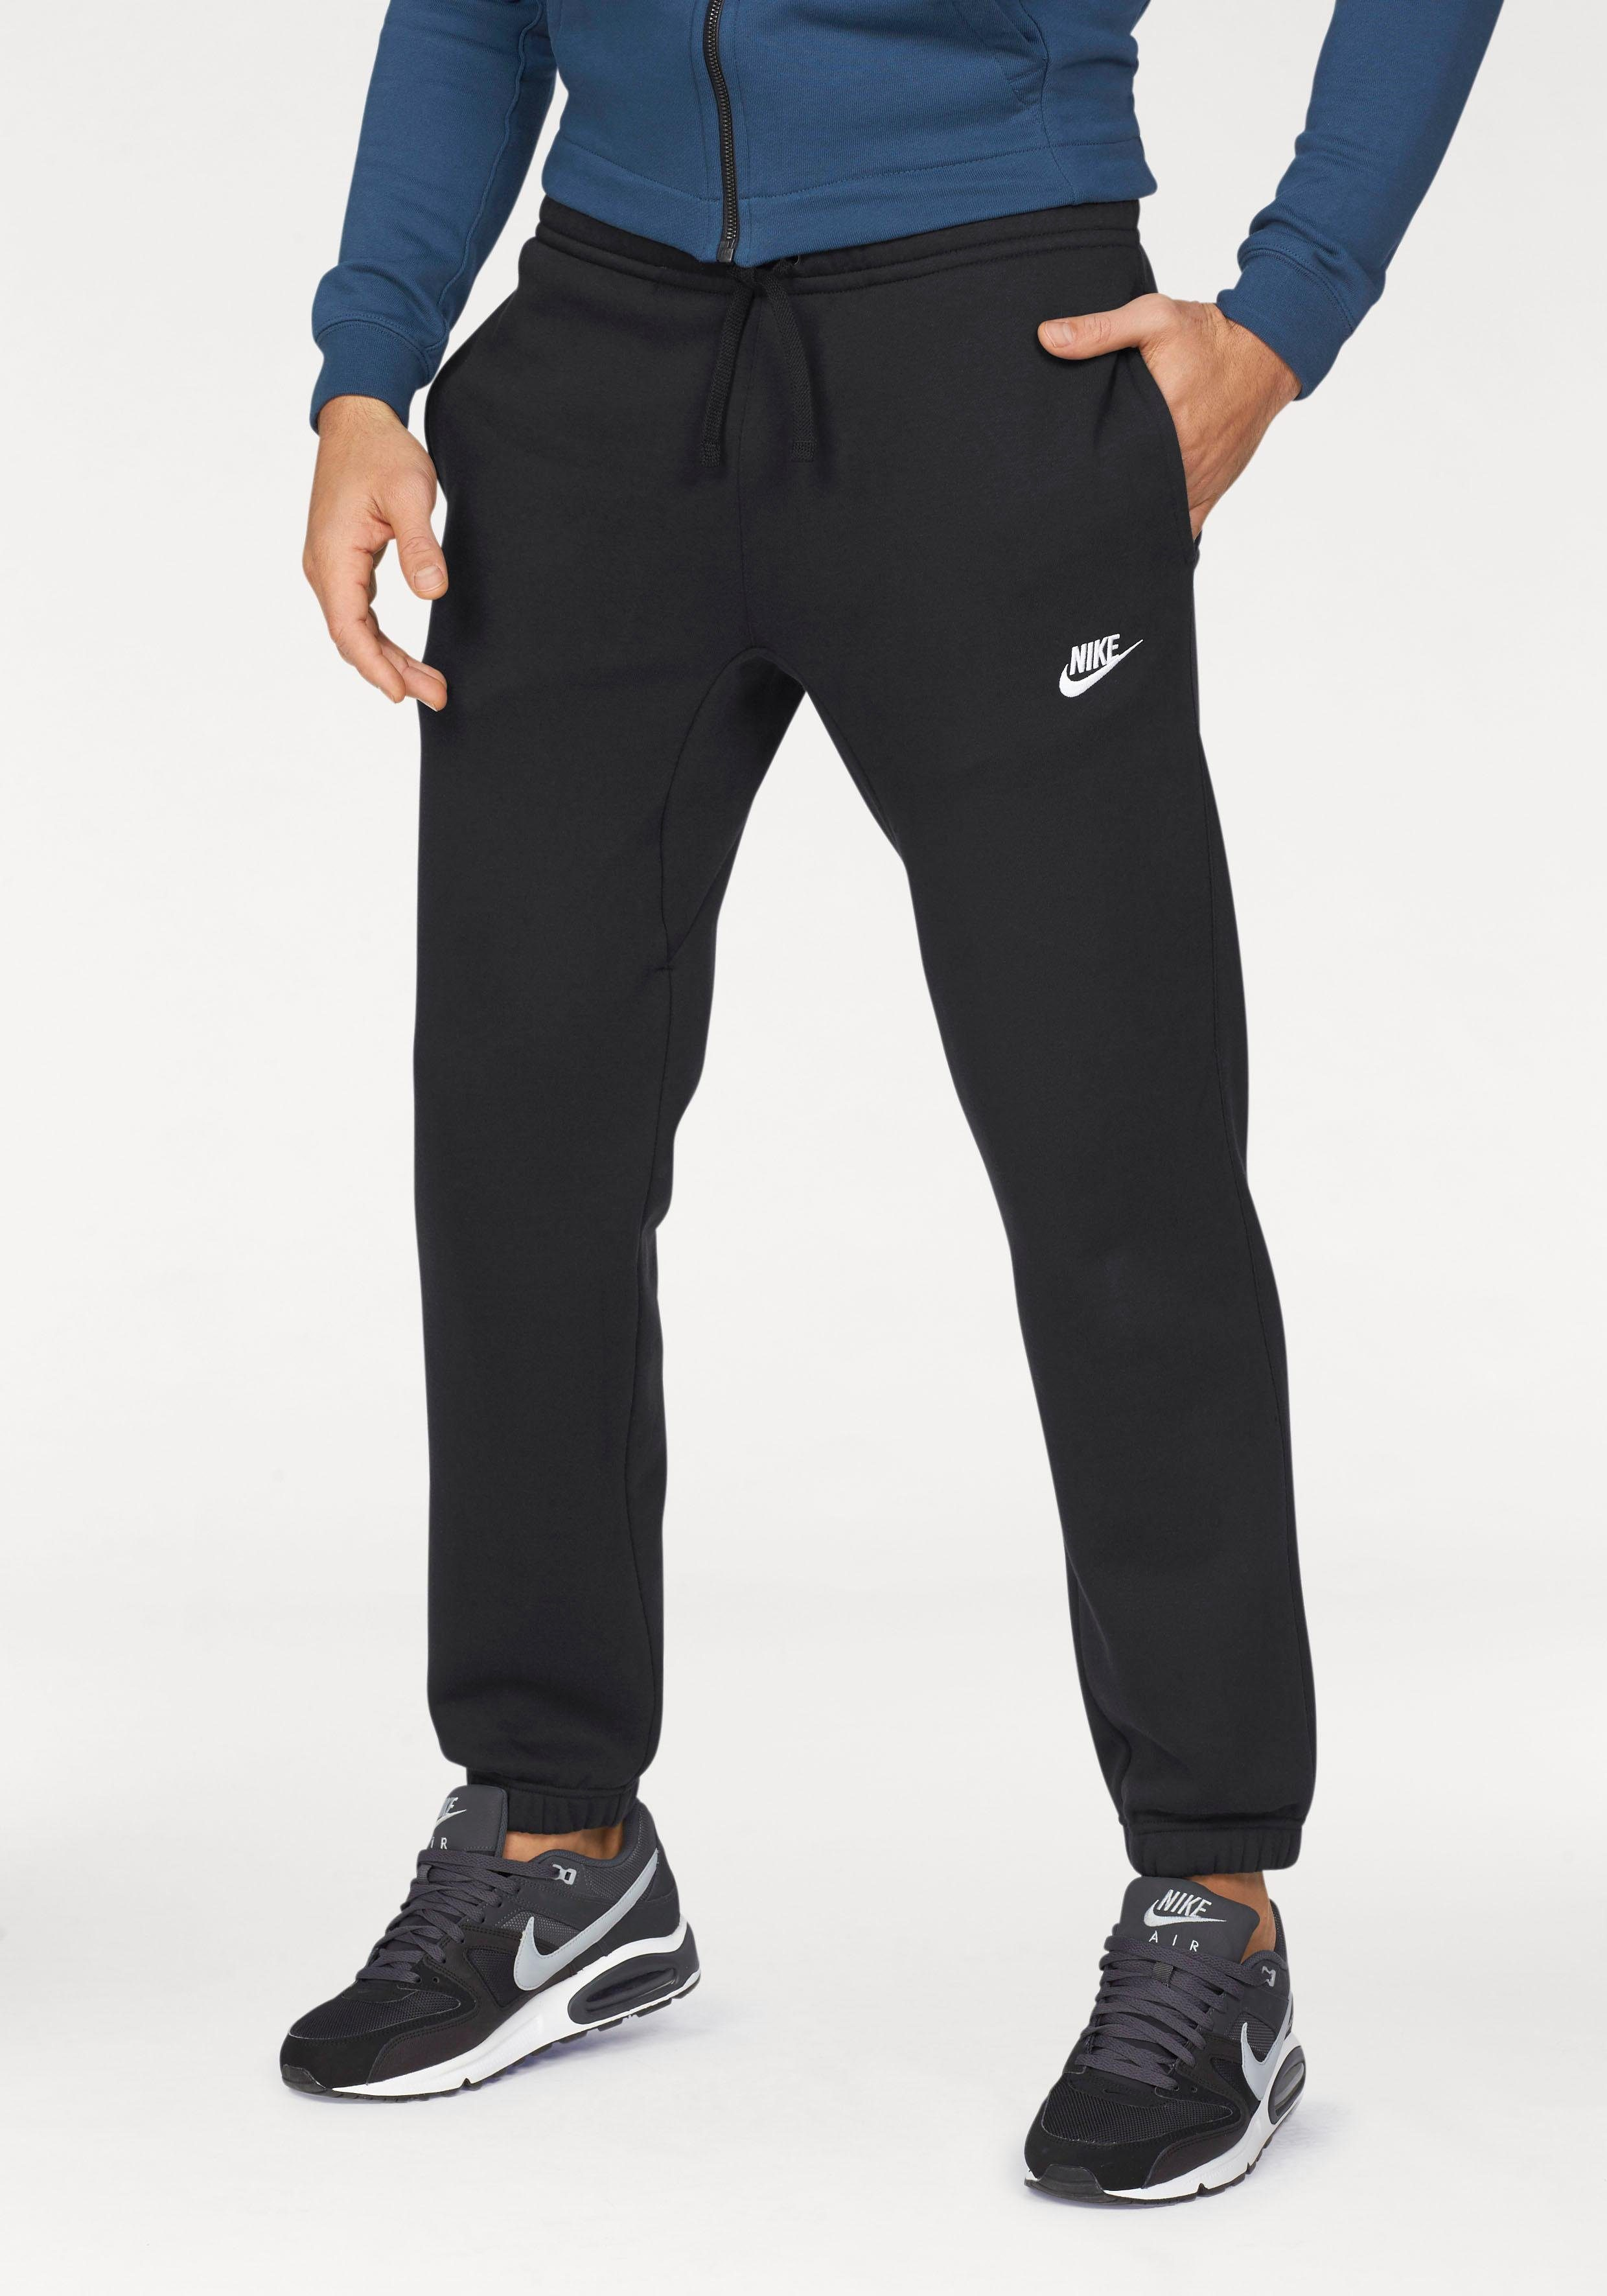 Nike Sportswear Jogginghose »NSW PANT CUFF FLEECE CLUB« online kaufen   OTTO